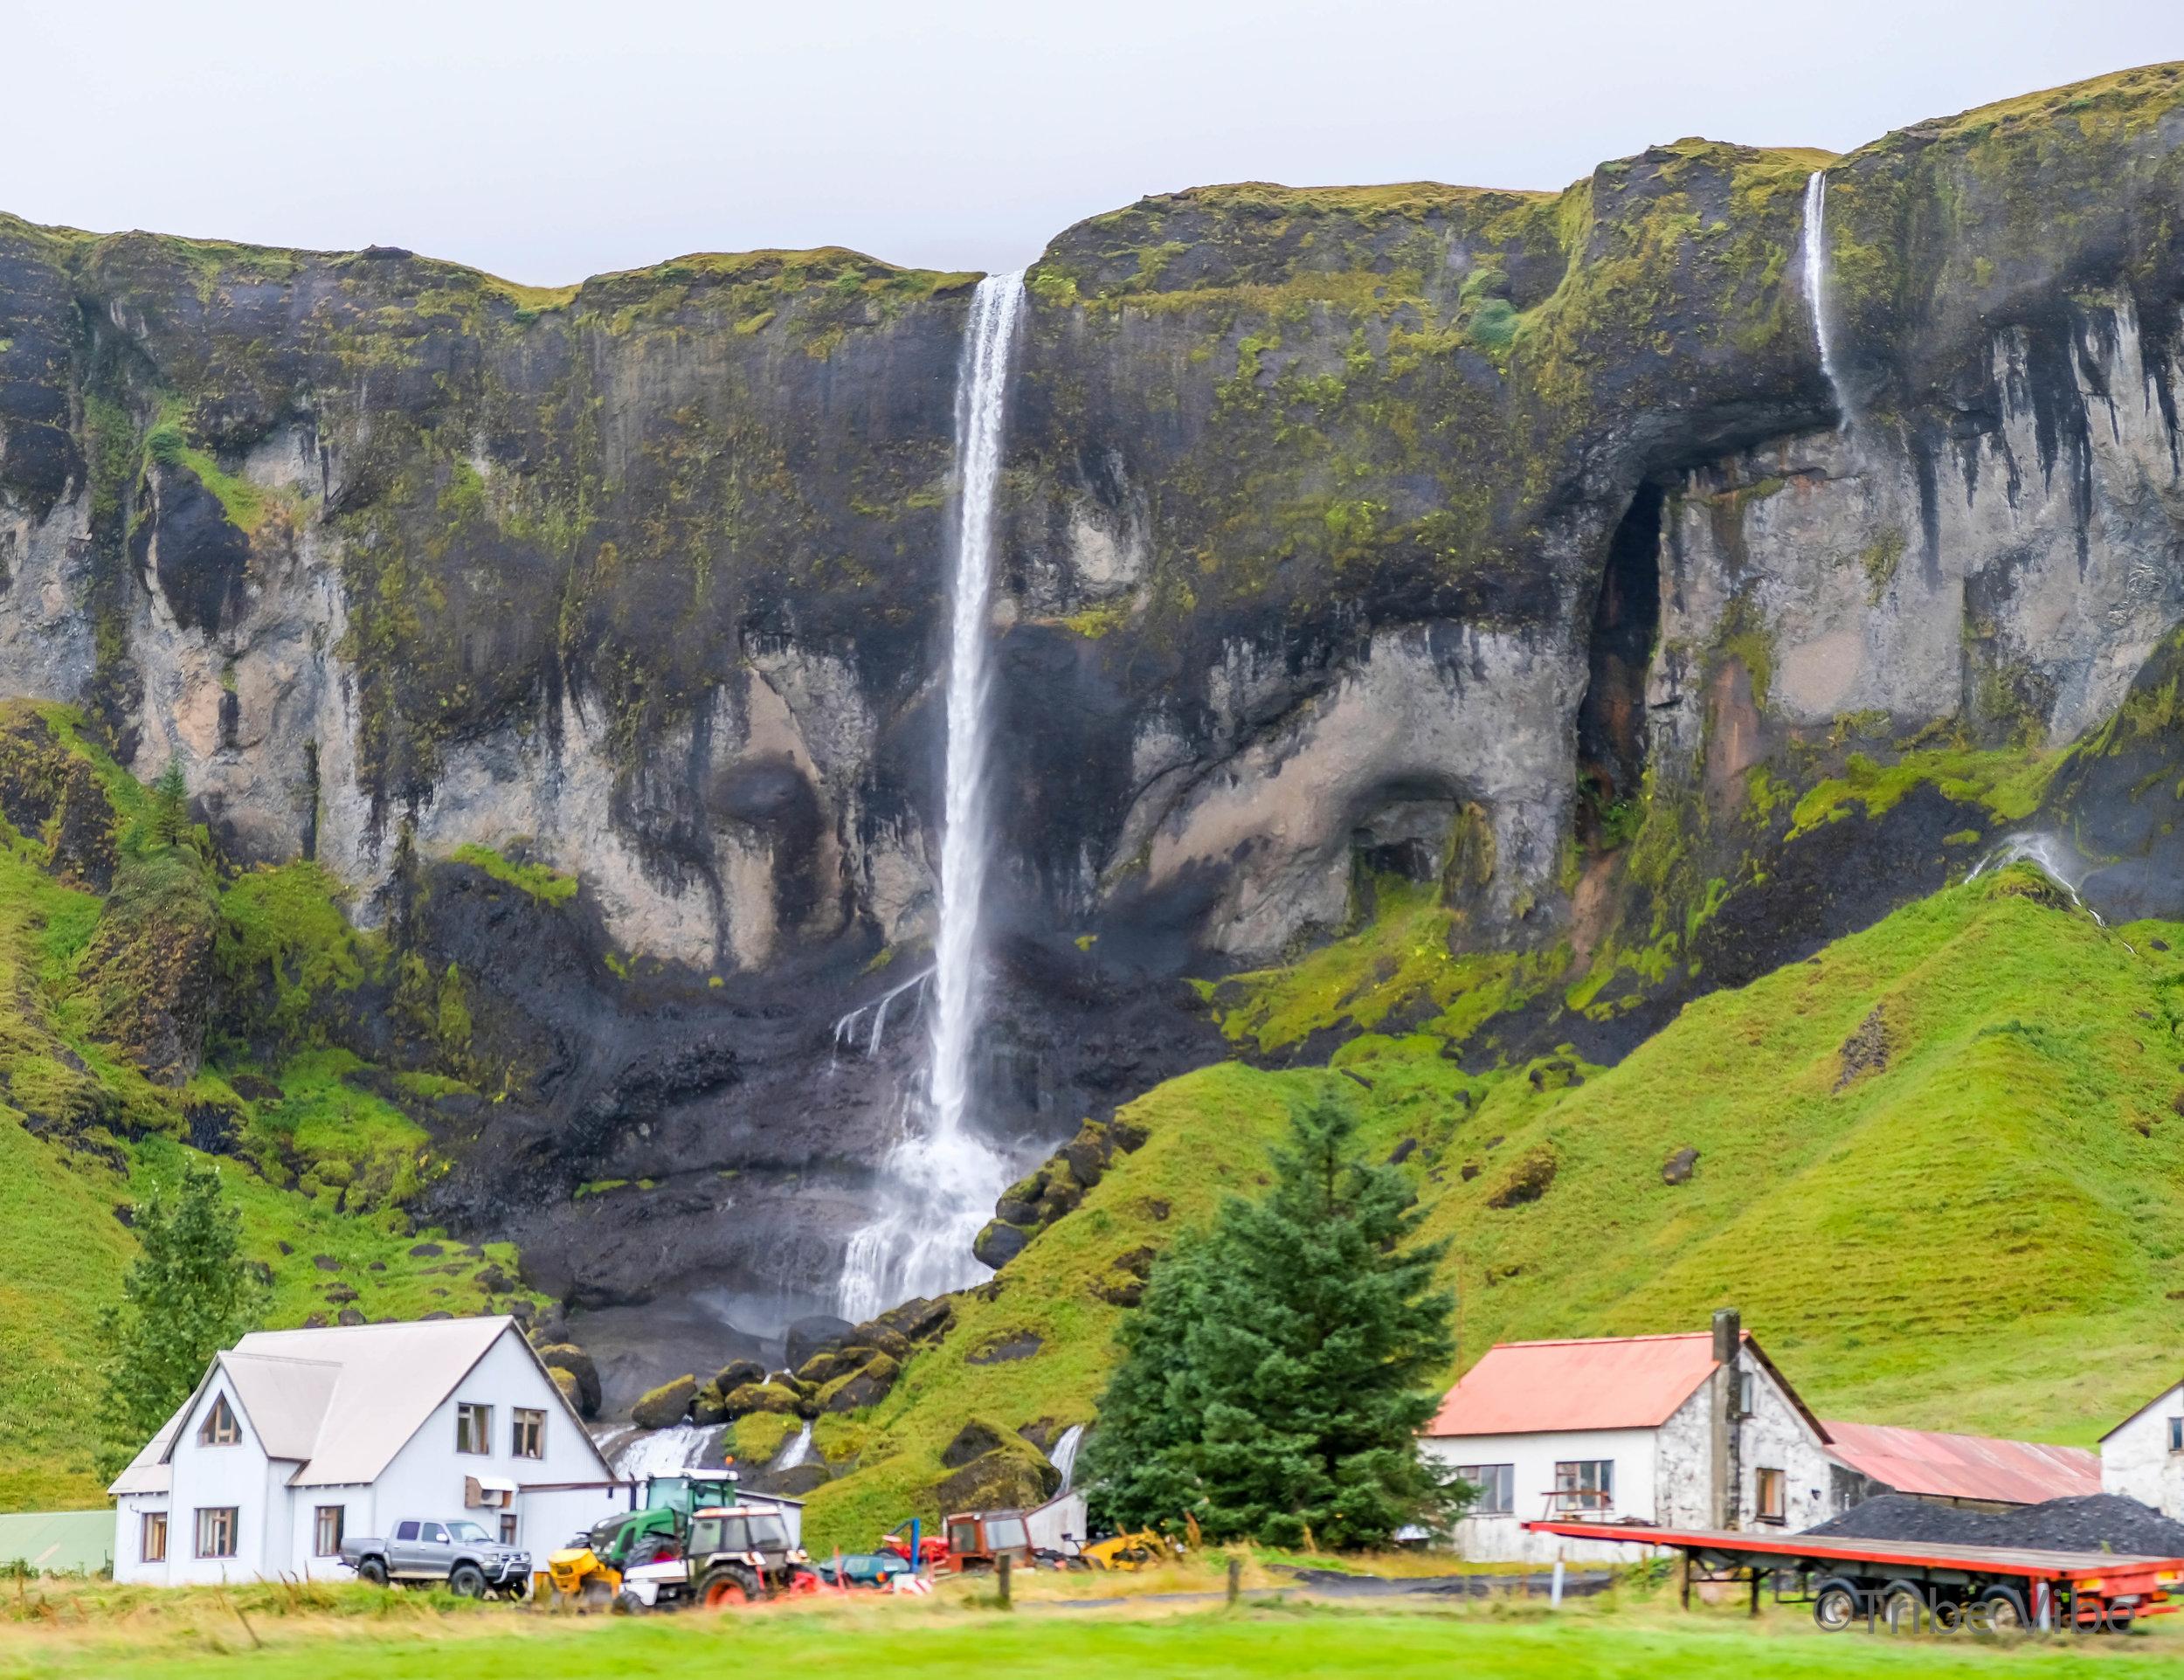 Imagine if you had a waterfall in your backyard?